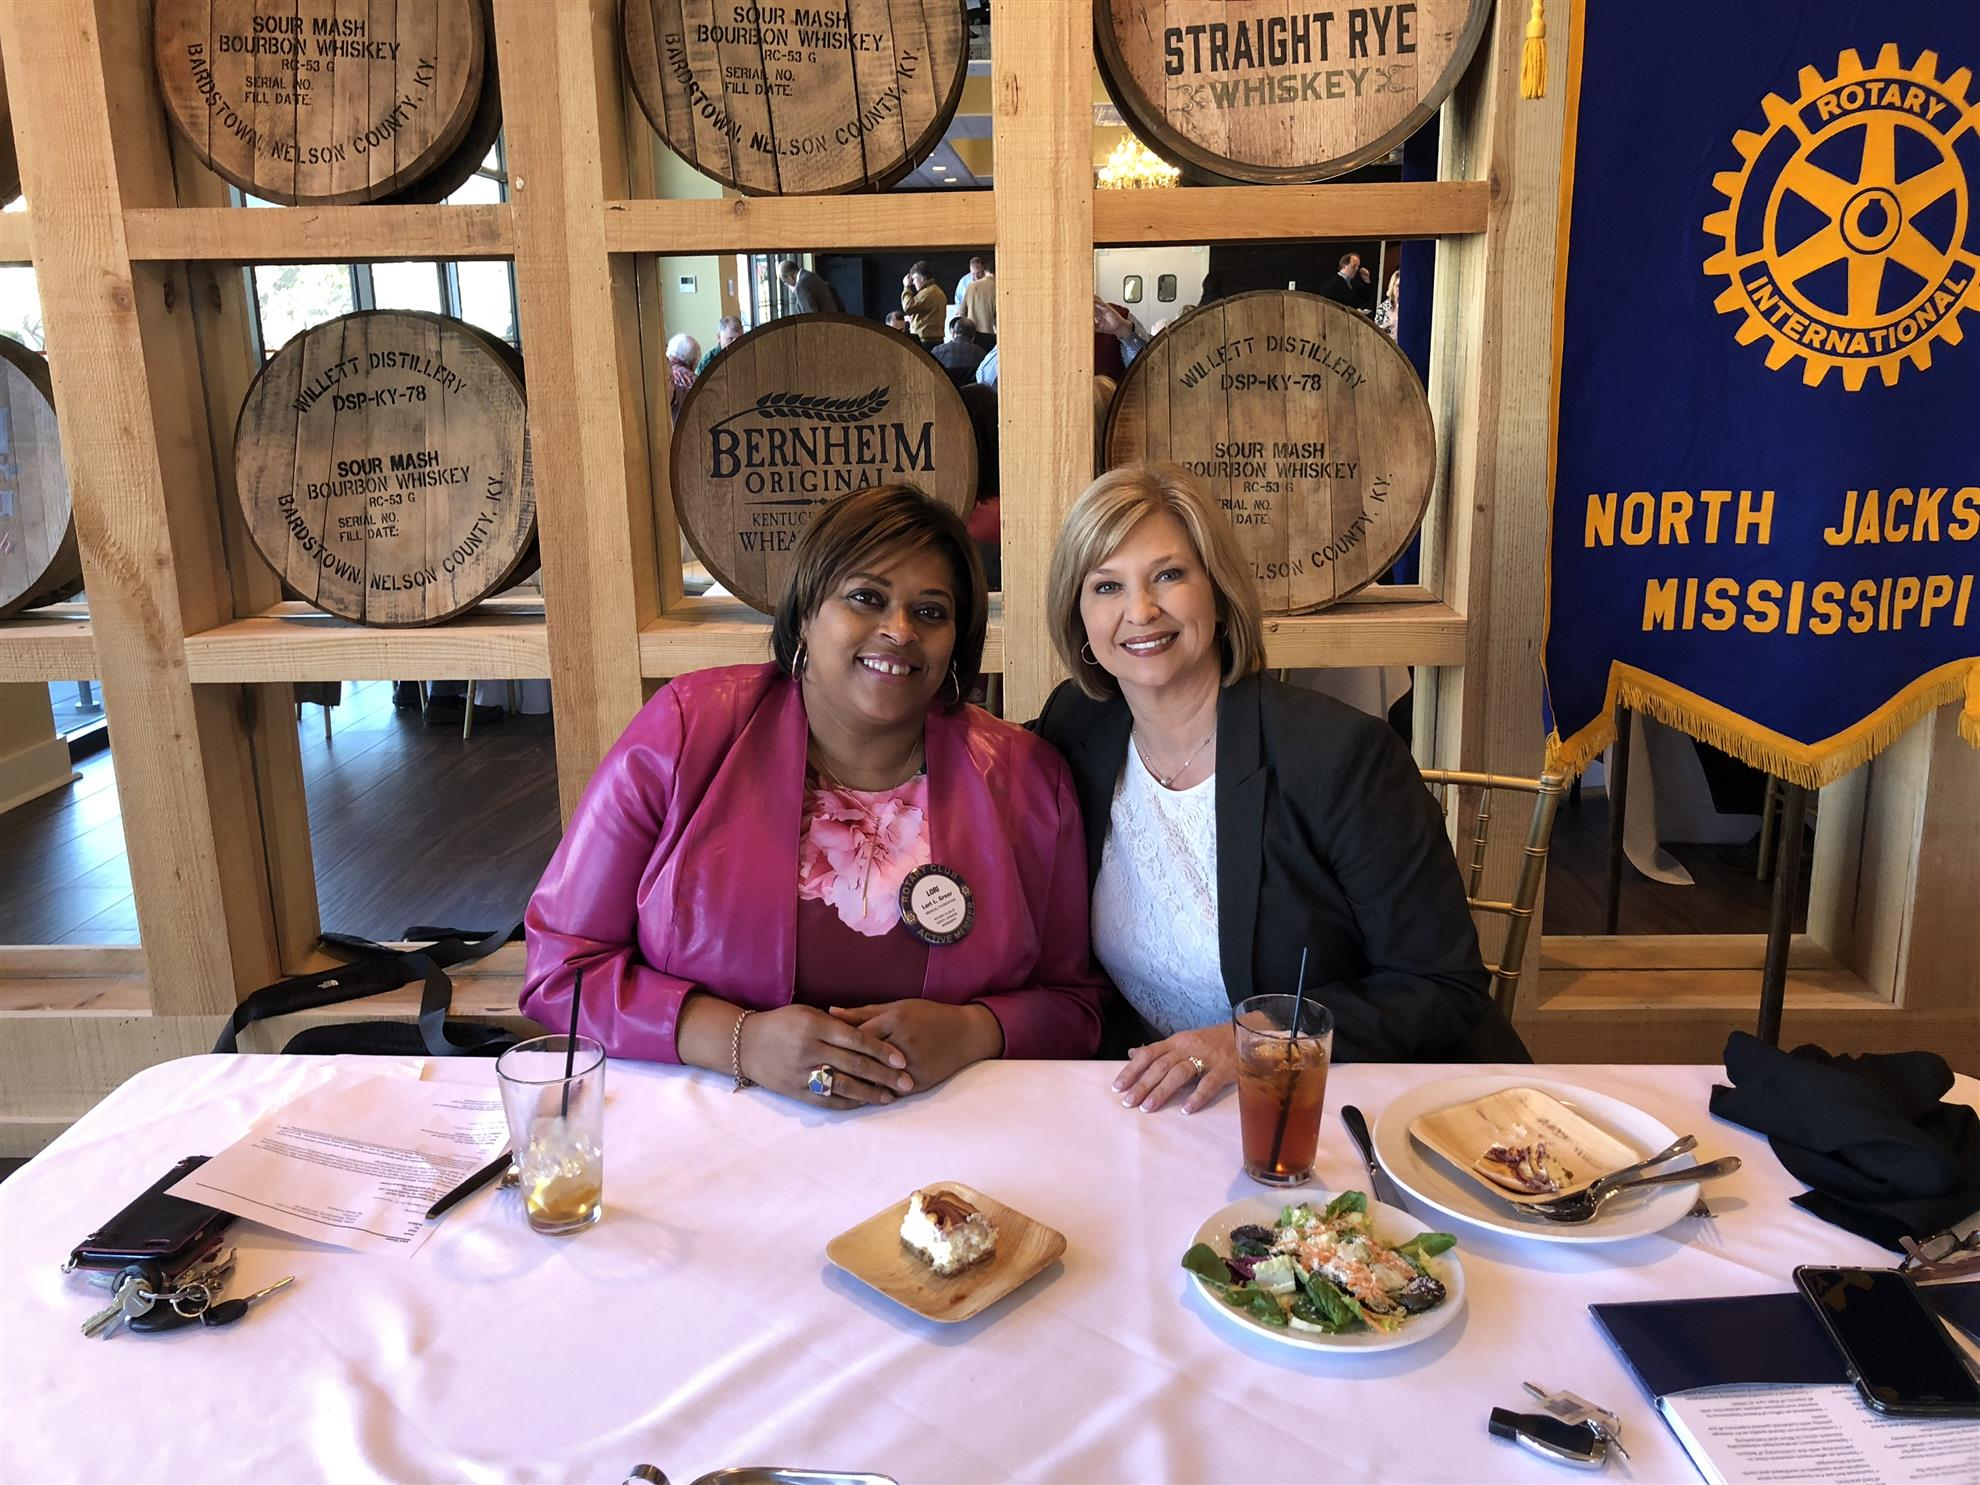 Stories | Rotary Club of North Jackson